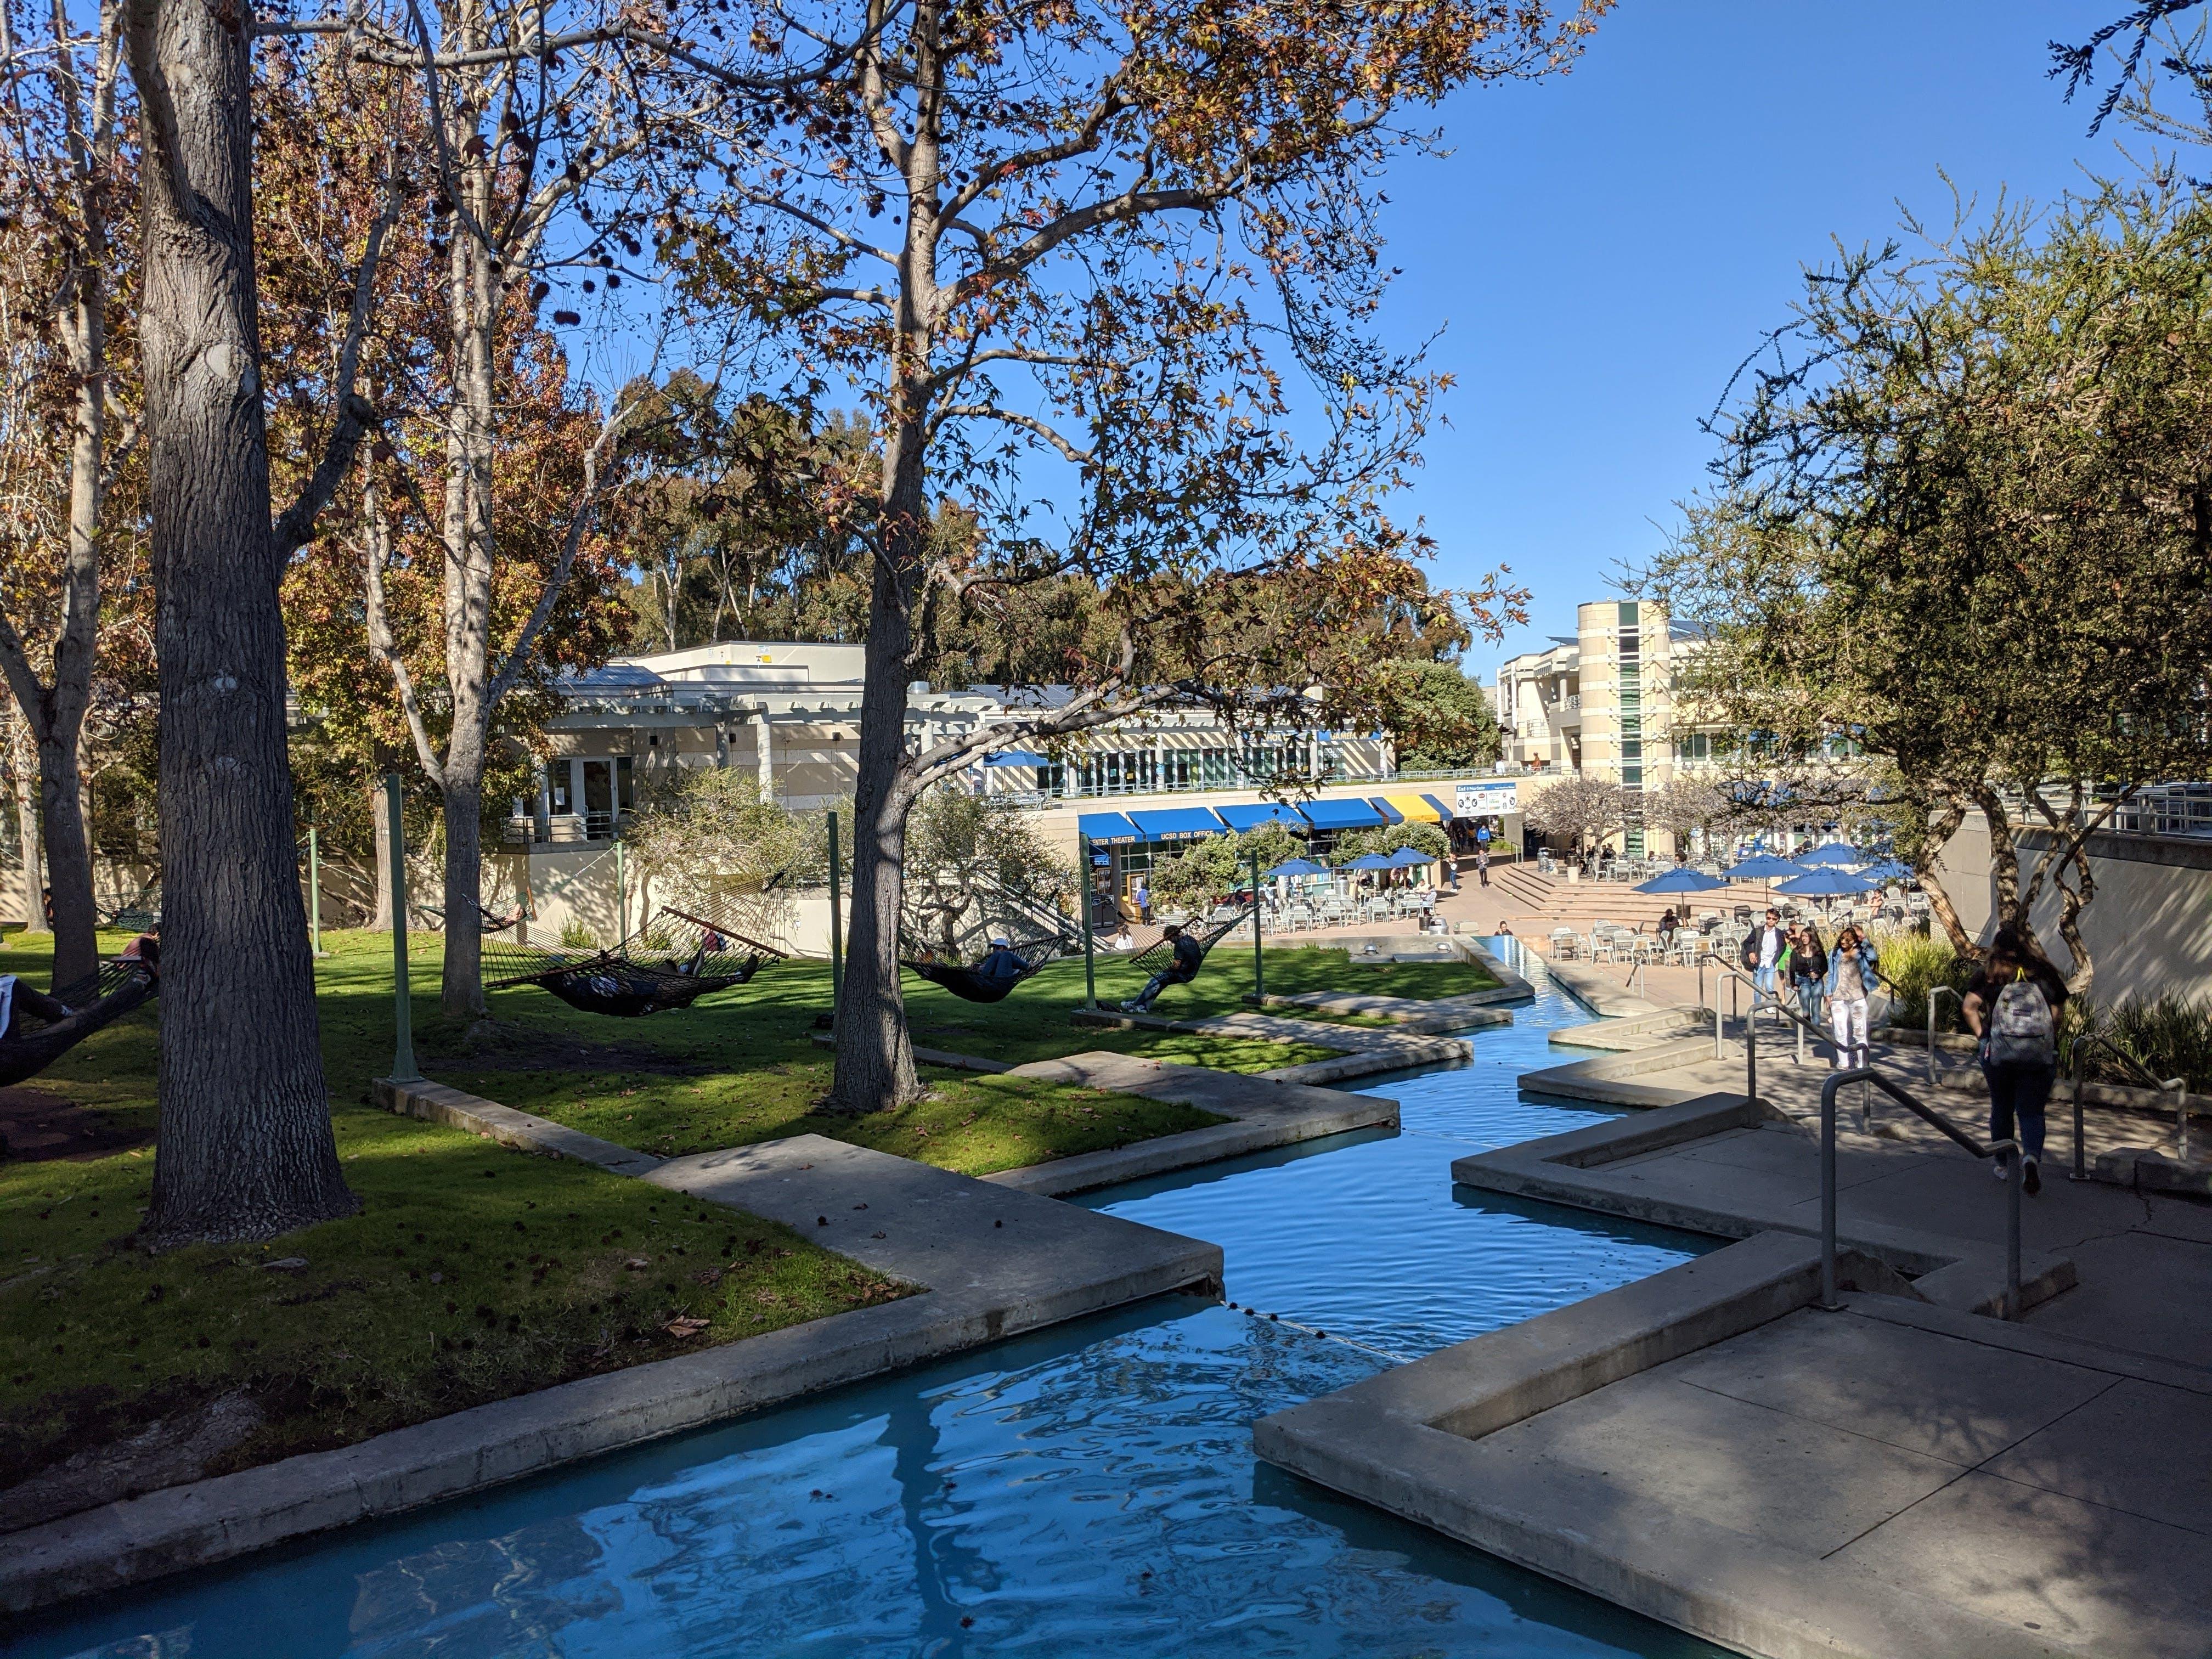 Waterway at University of California, San Diego